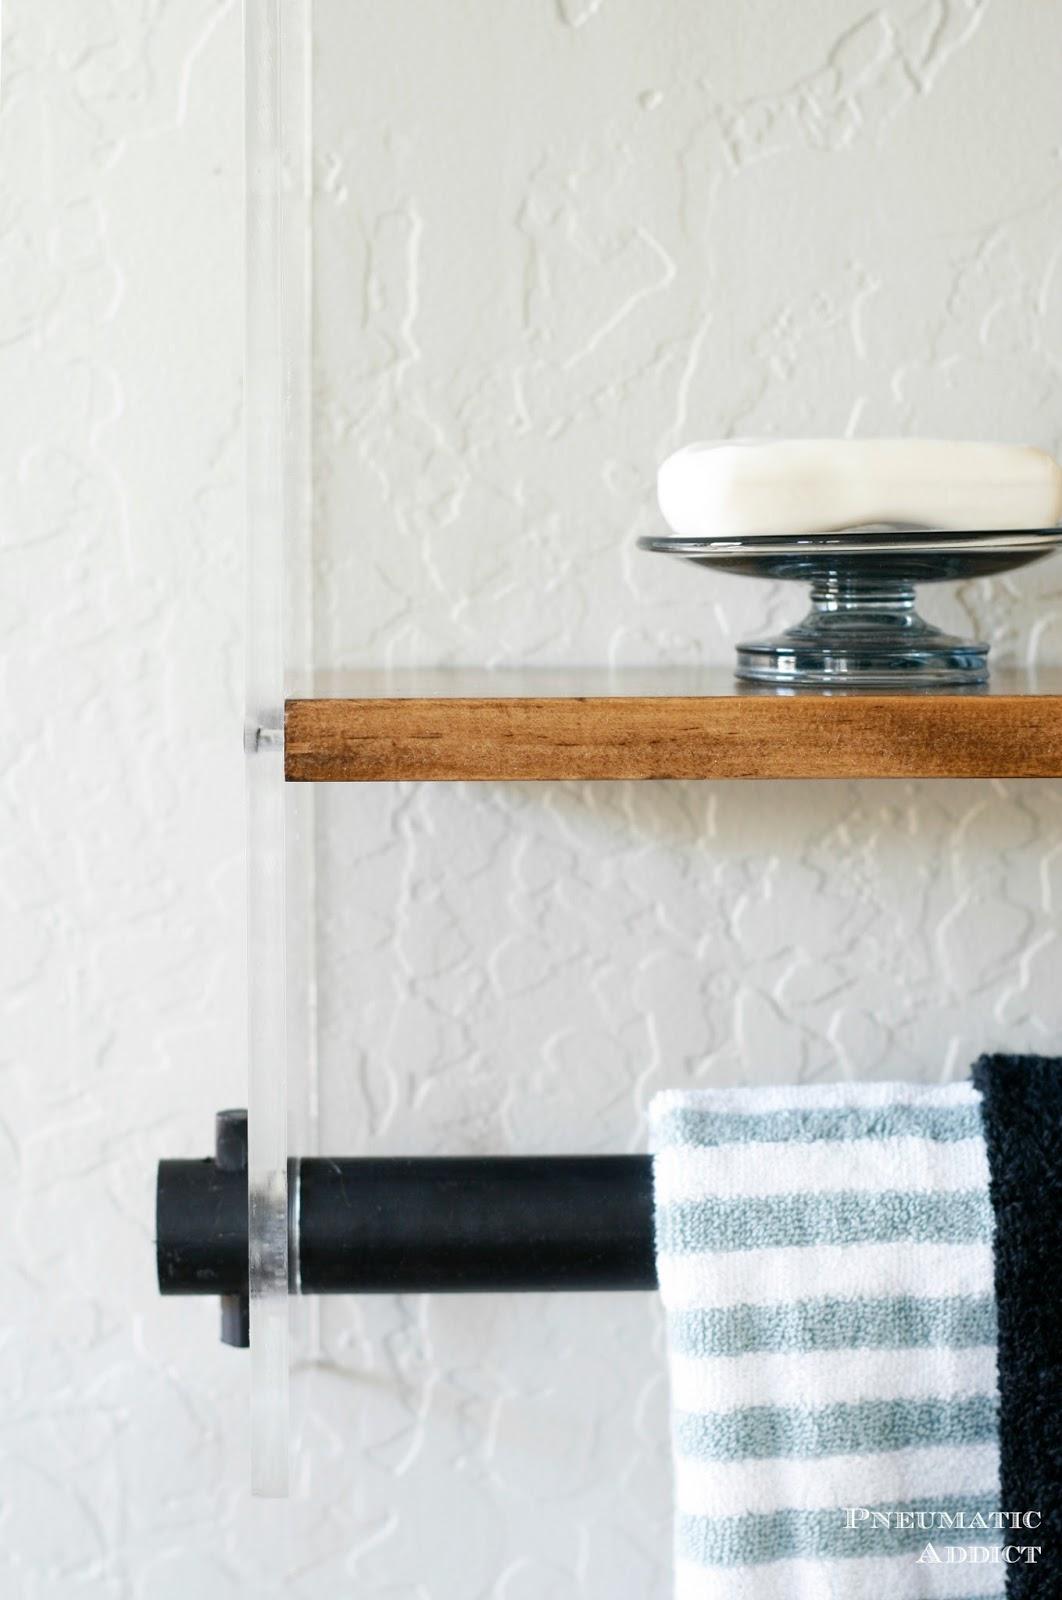 Wood and Acrylic Bathroom Shelf   Pneumatic Addict